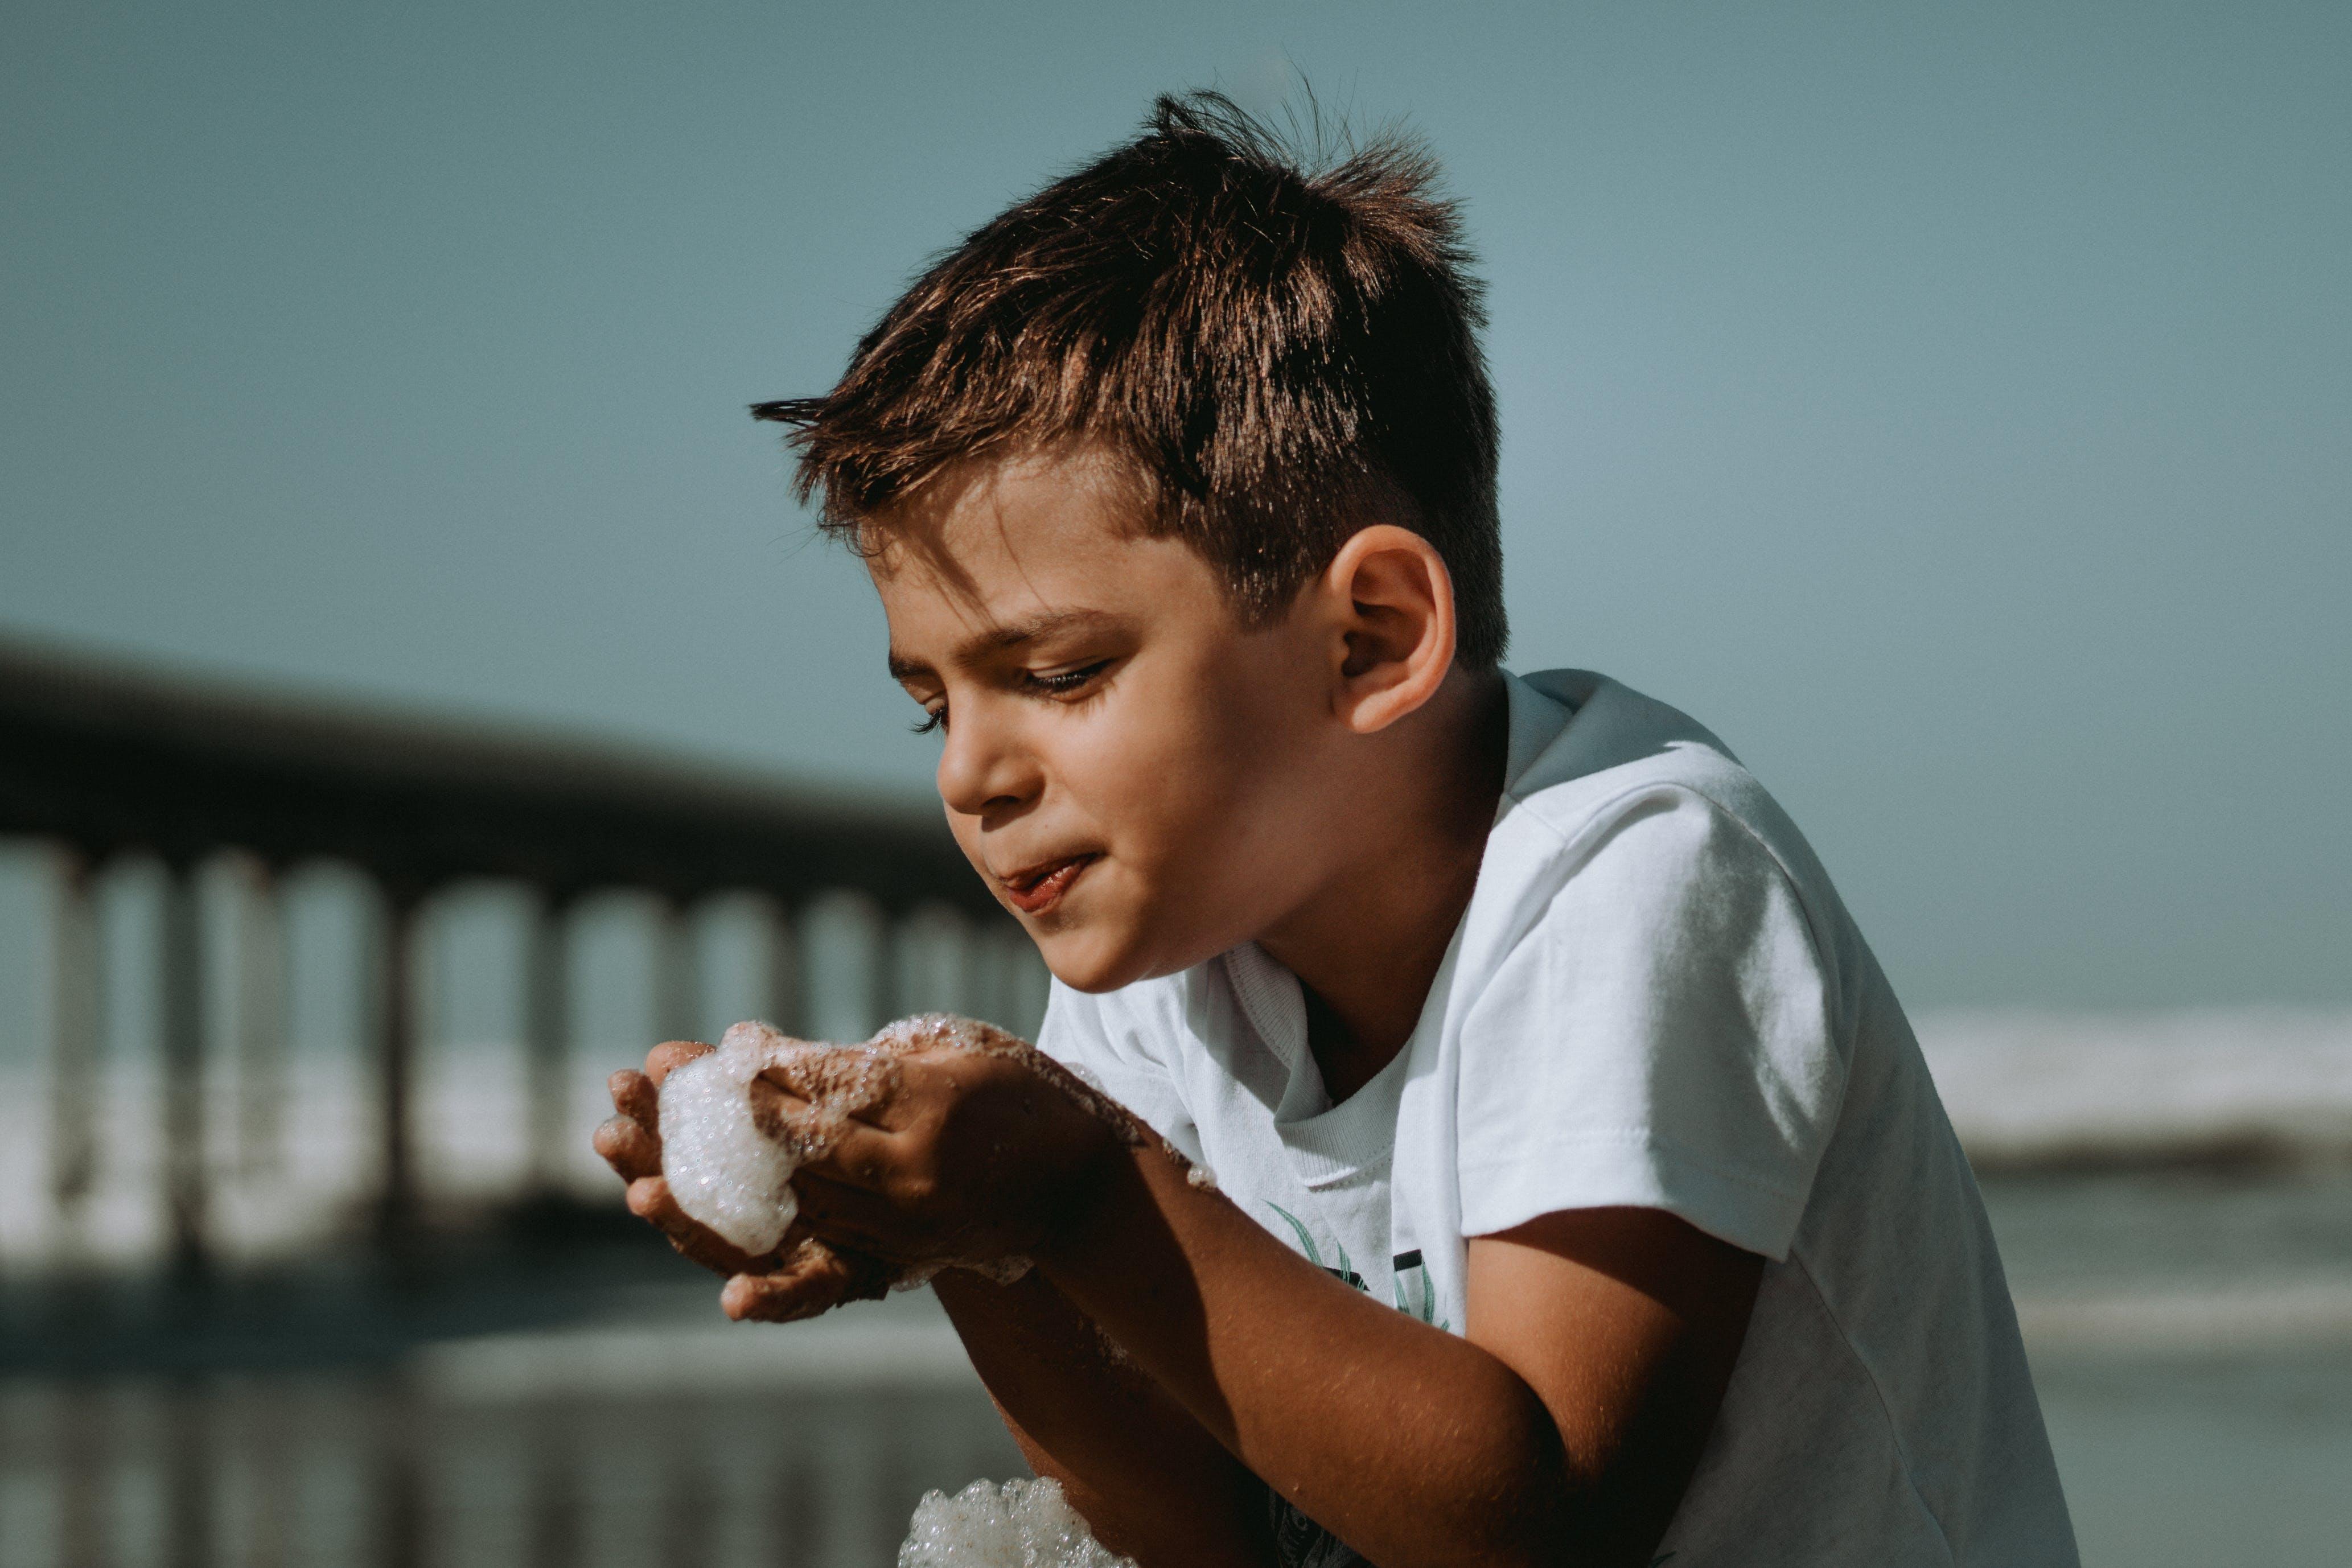 Kostenloses Stock Foto zu bezaubernd, blowing bubbles, freizeit, jung